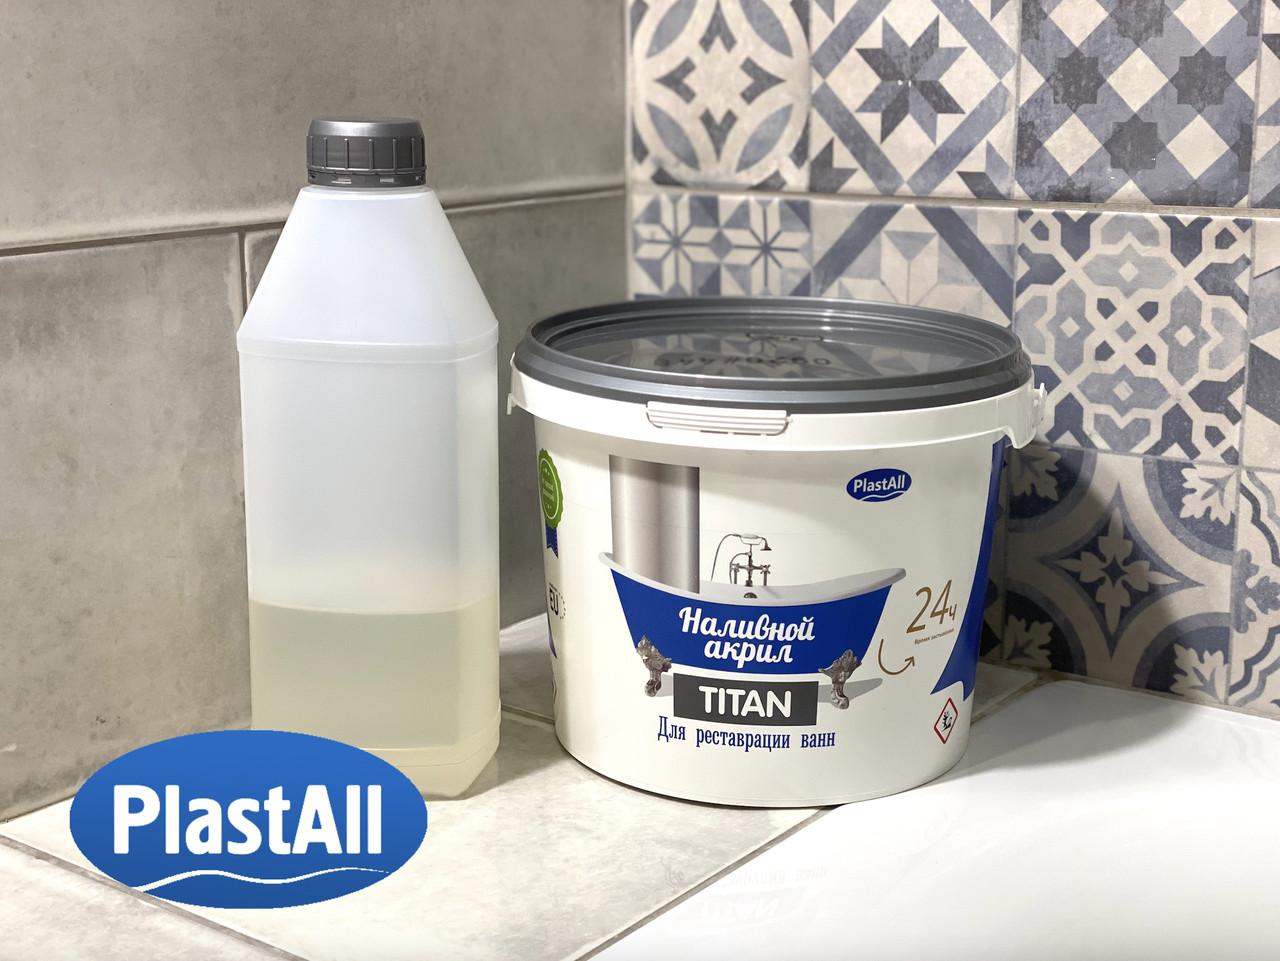 Жидкий акрил для реставрации ванны Пластол Титан (Plastall Titan) 1.5м (2,9 кг) Оригинал